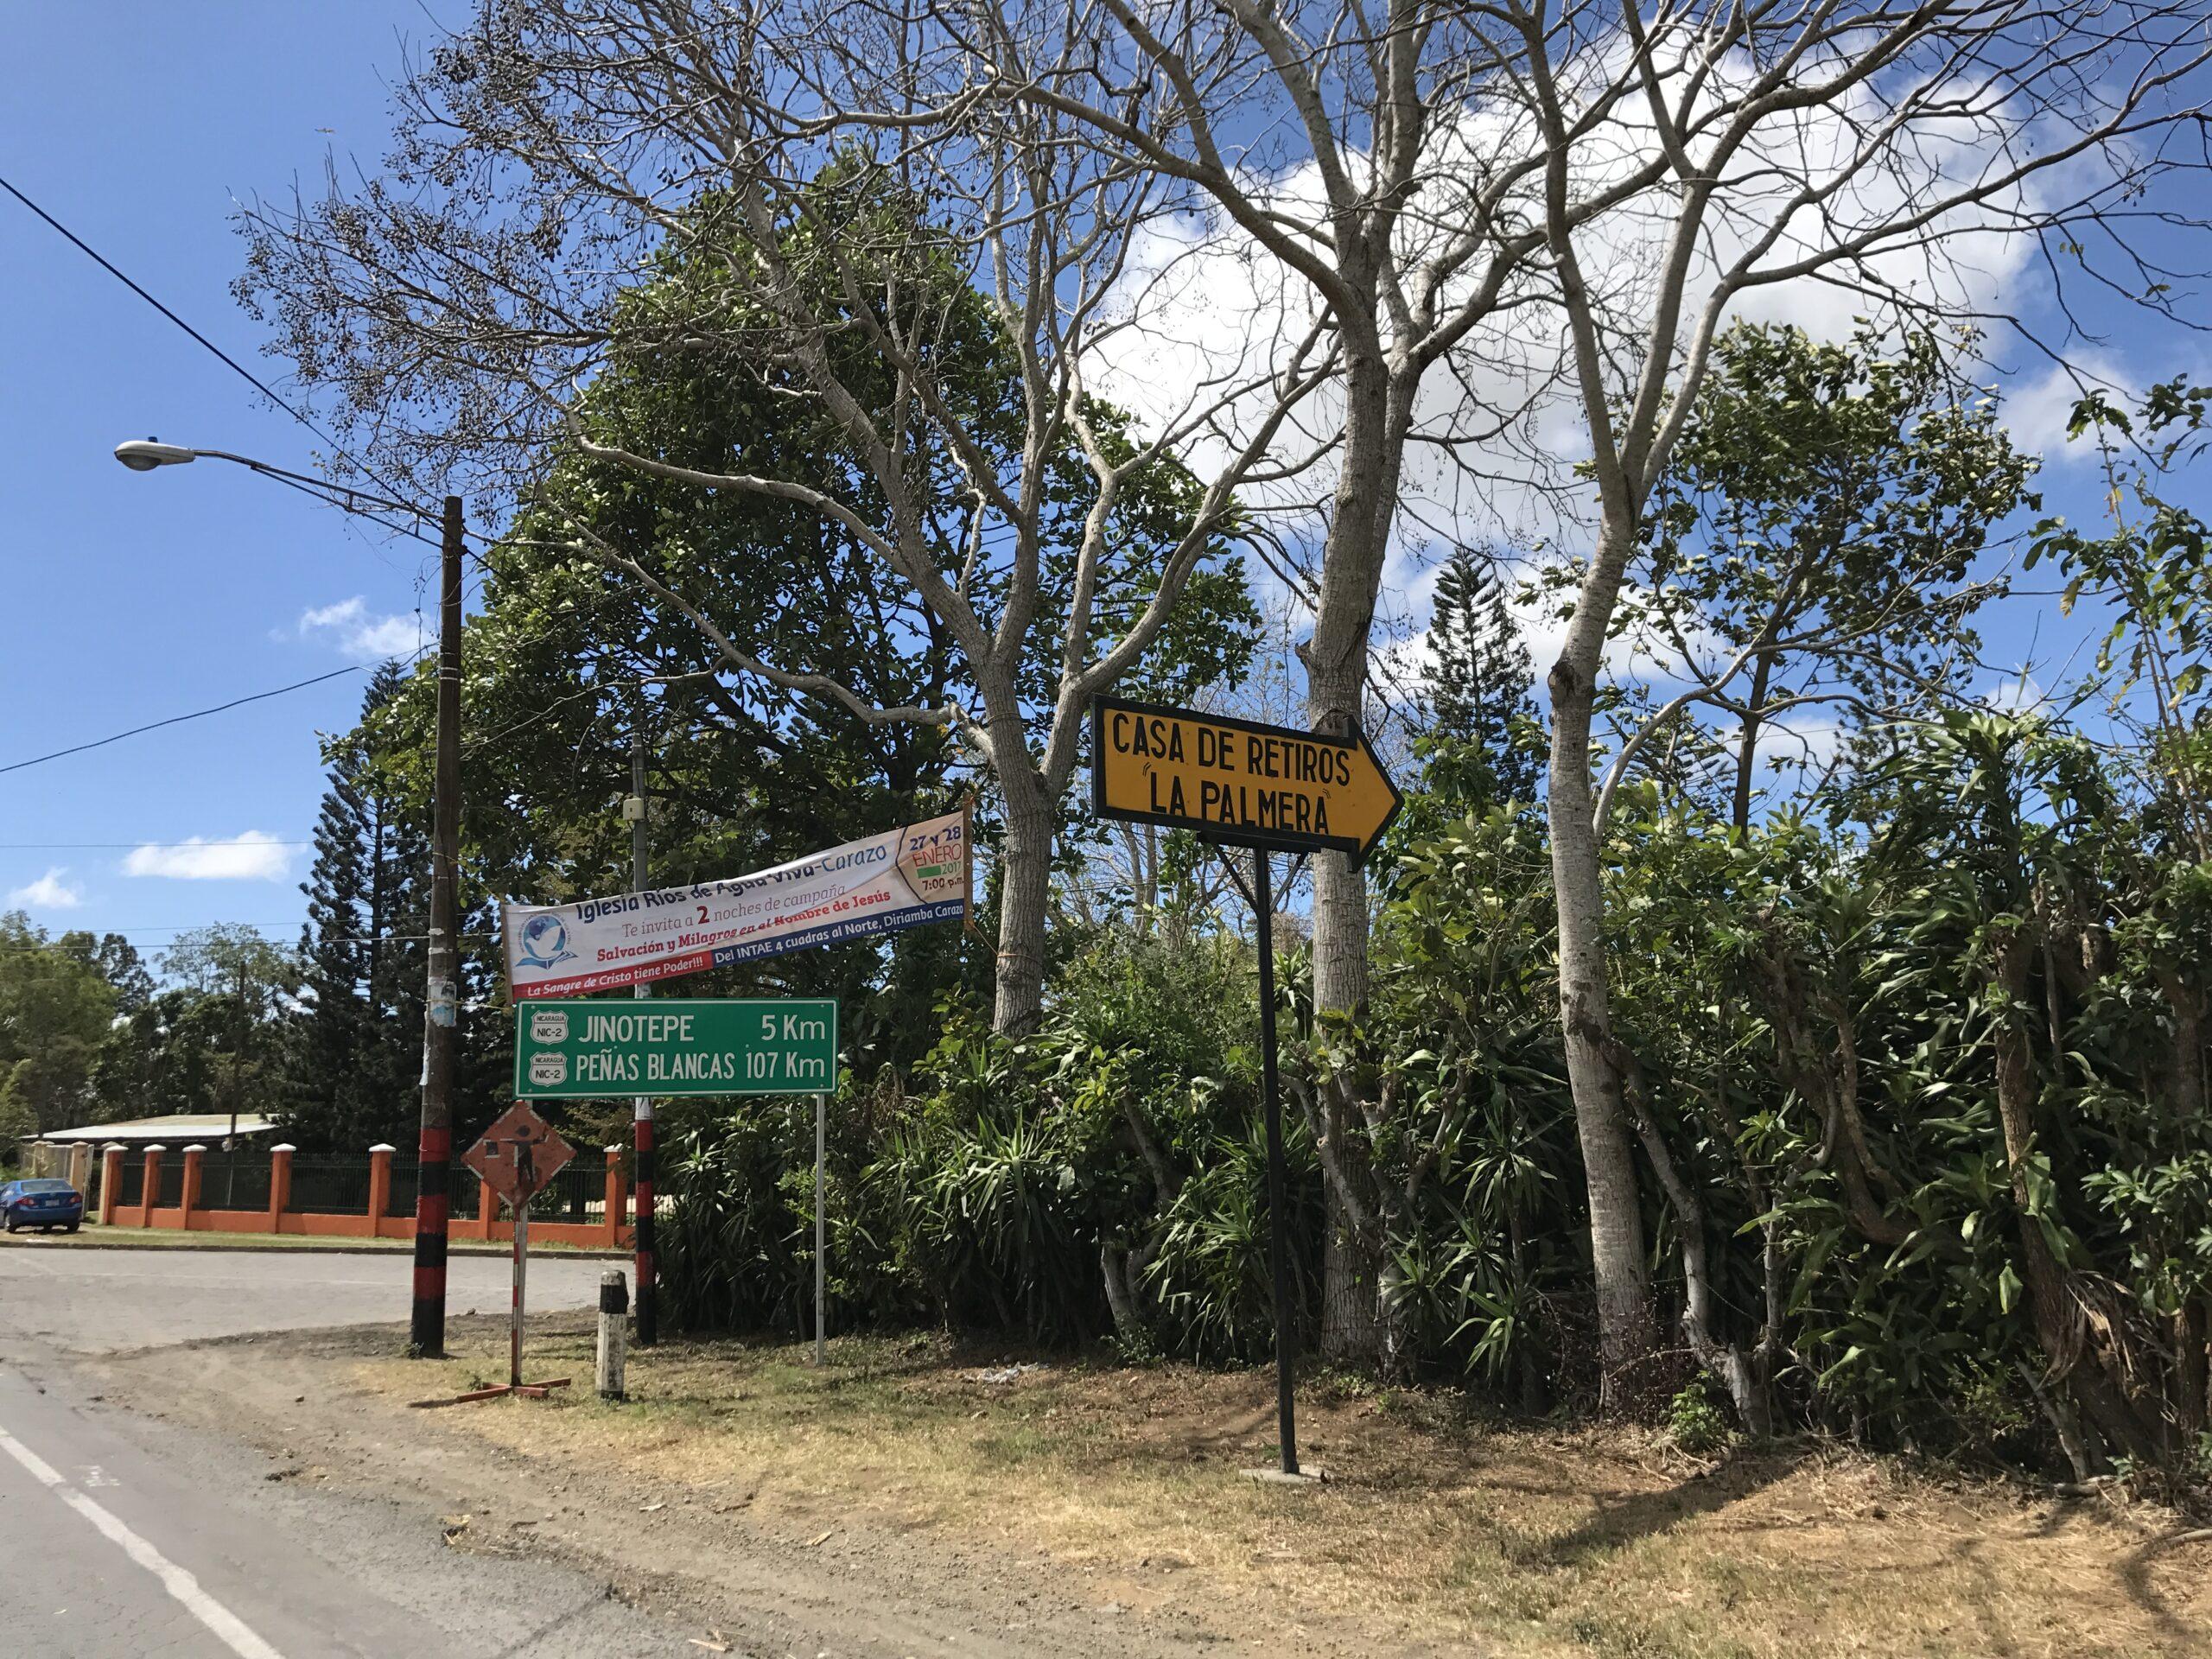 Cómo llegar hasta Jinotepe Carazo